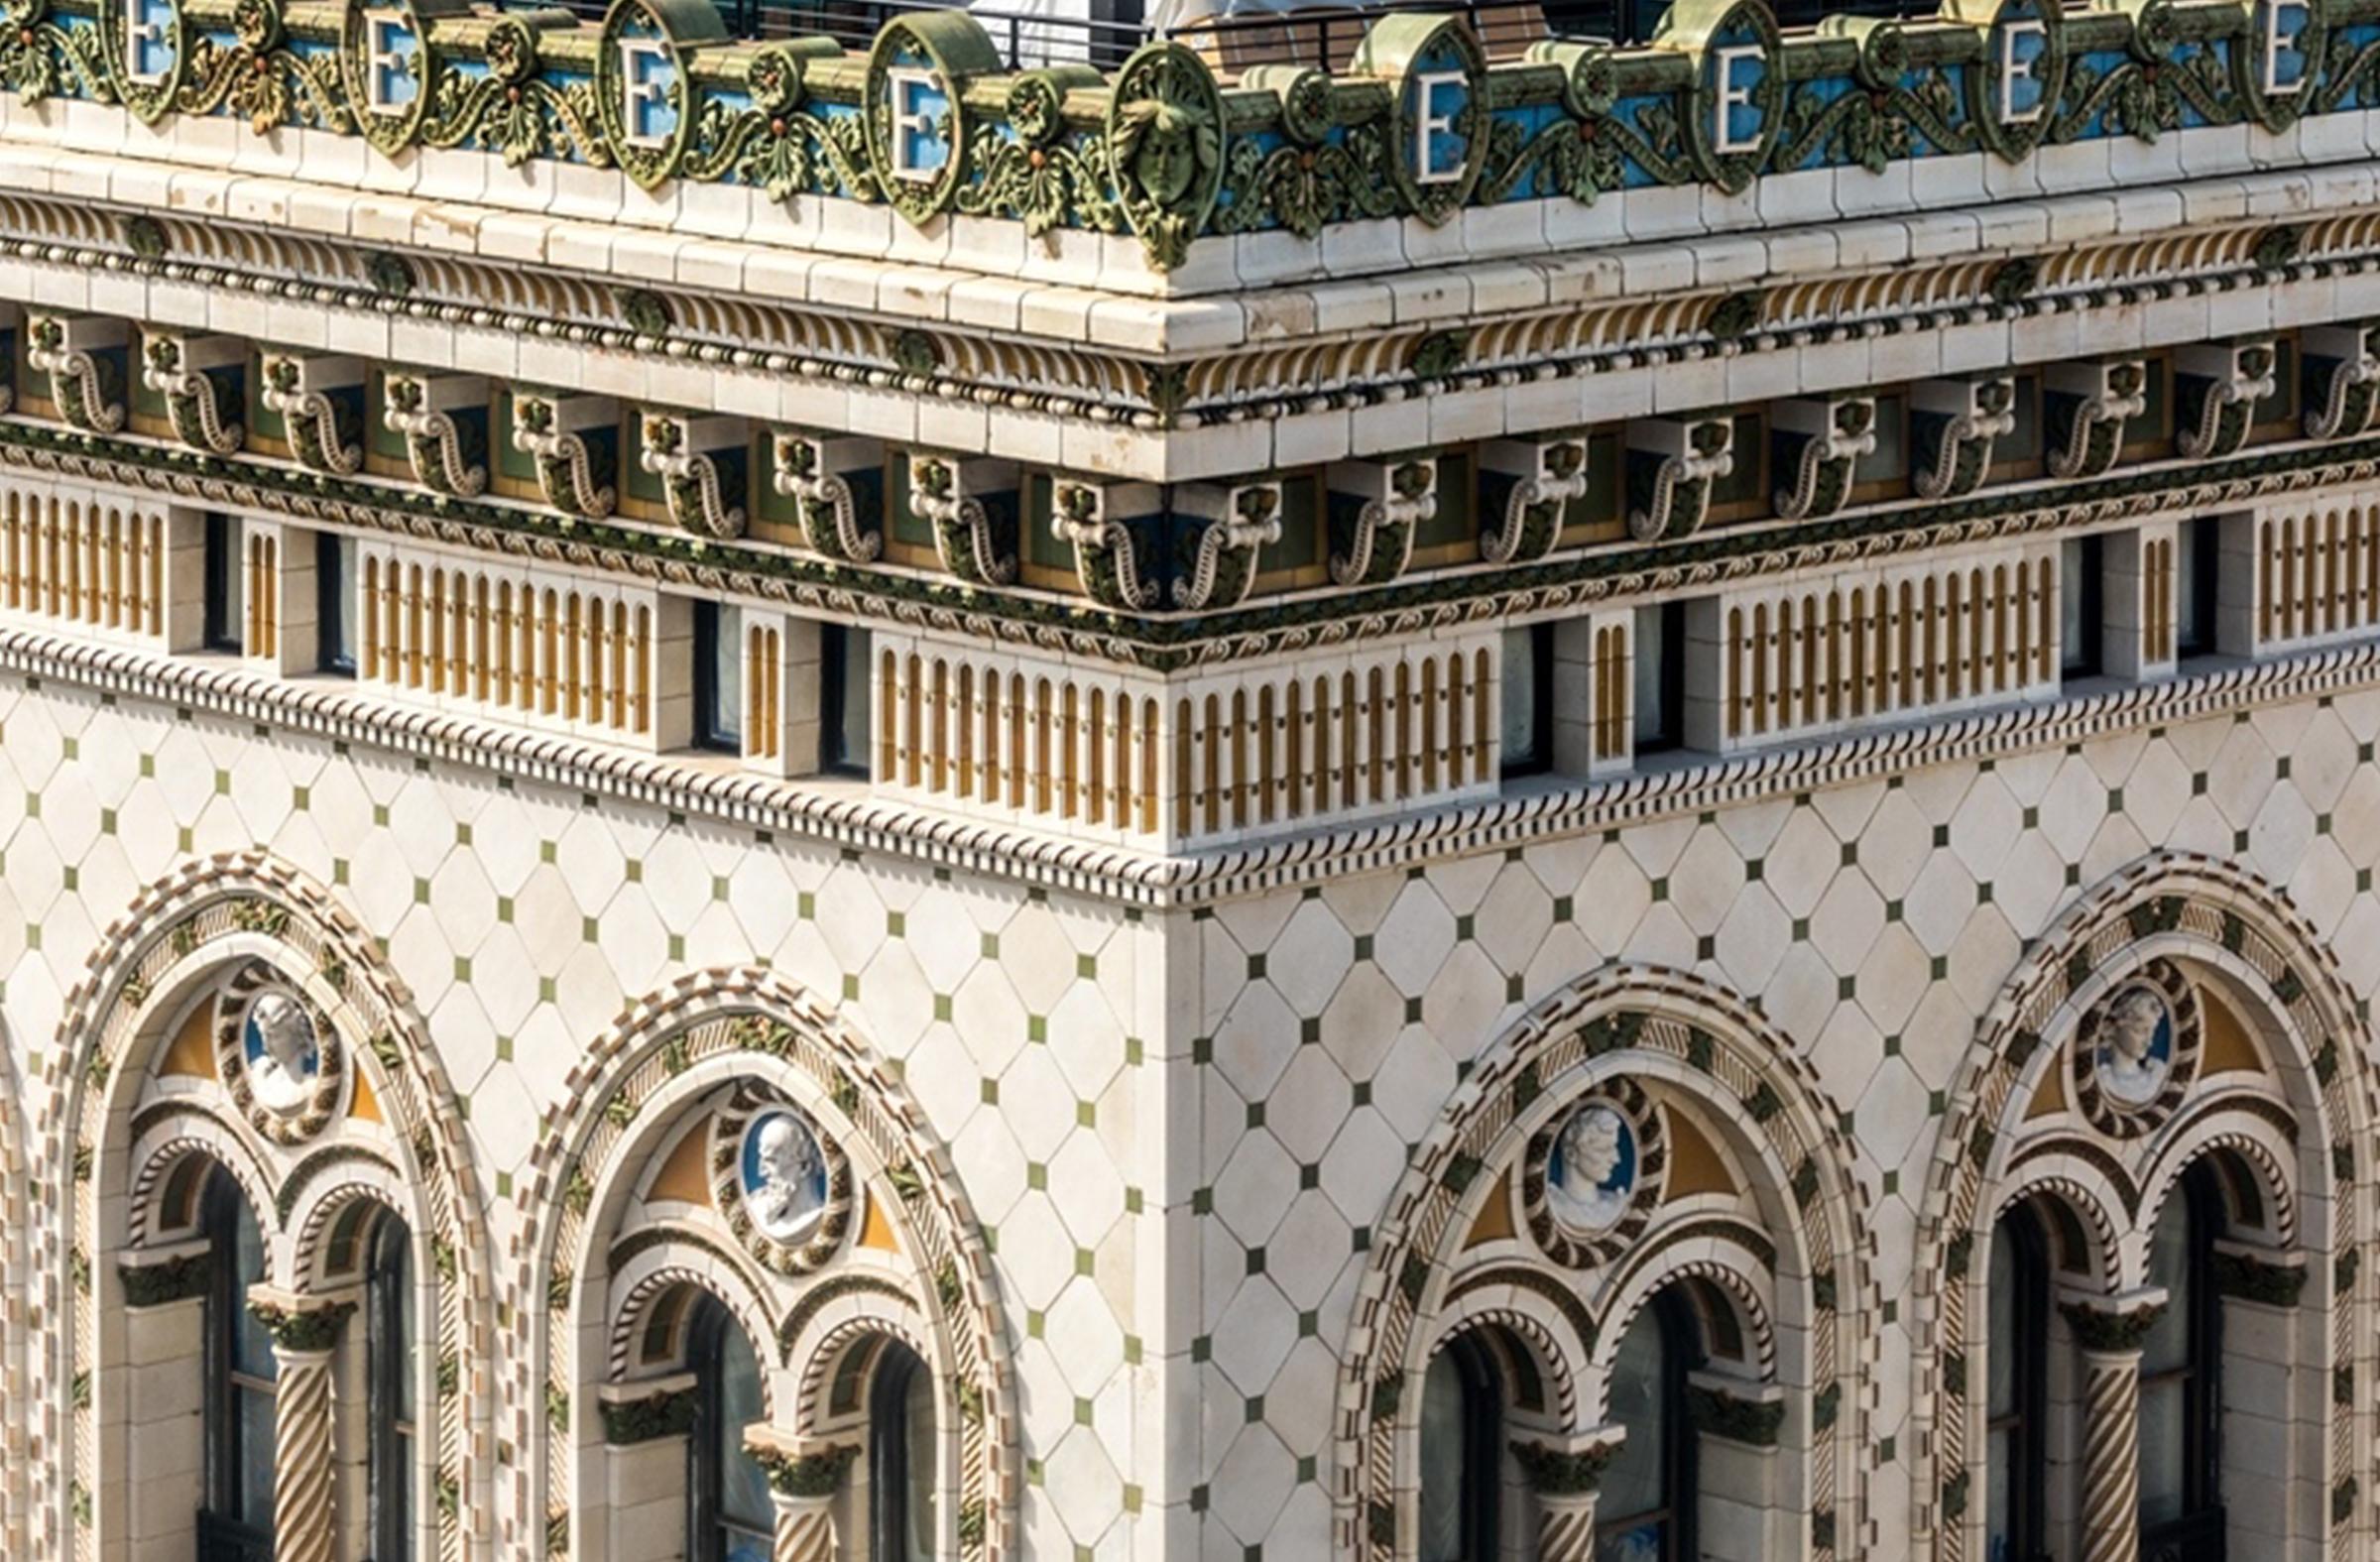 Exterior Building Ornate.jpg